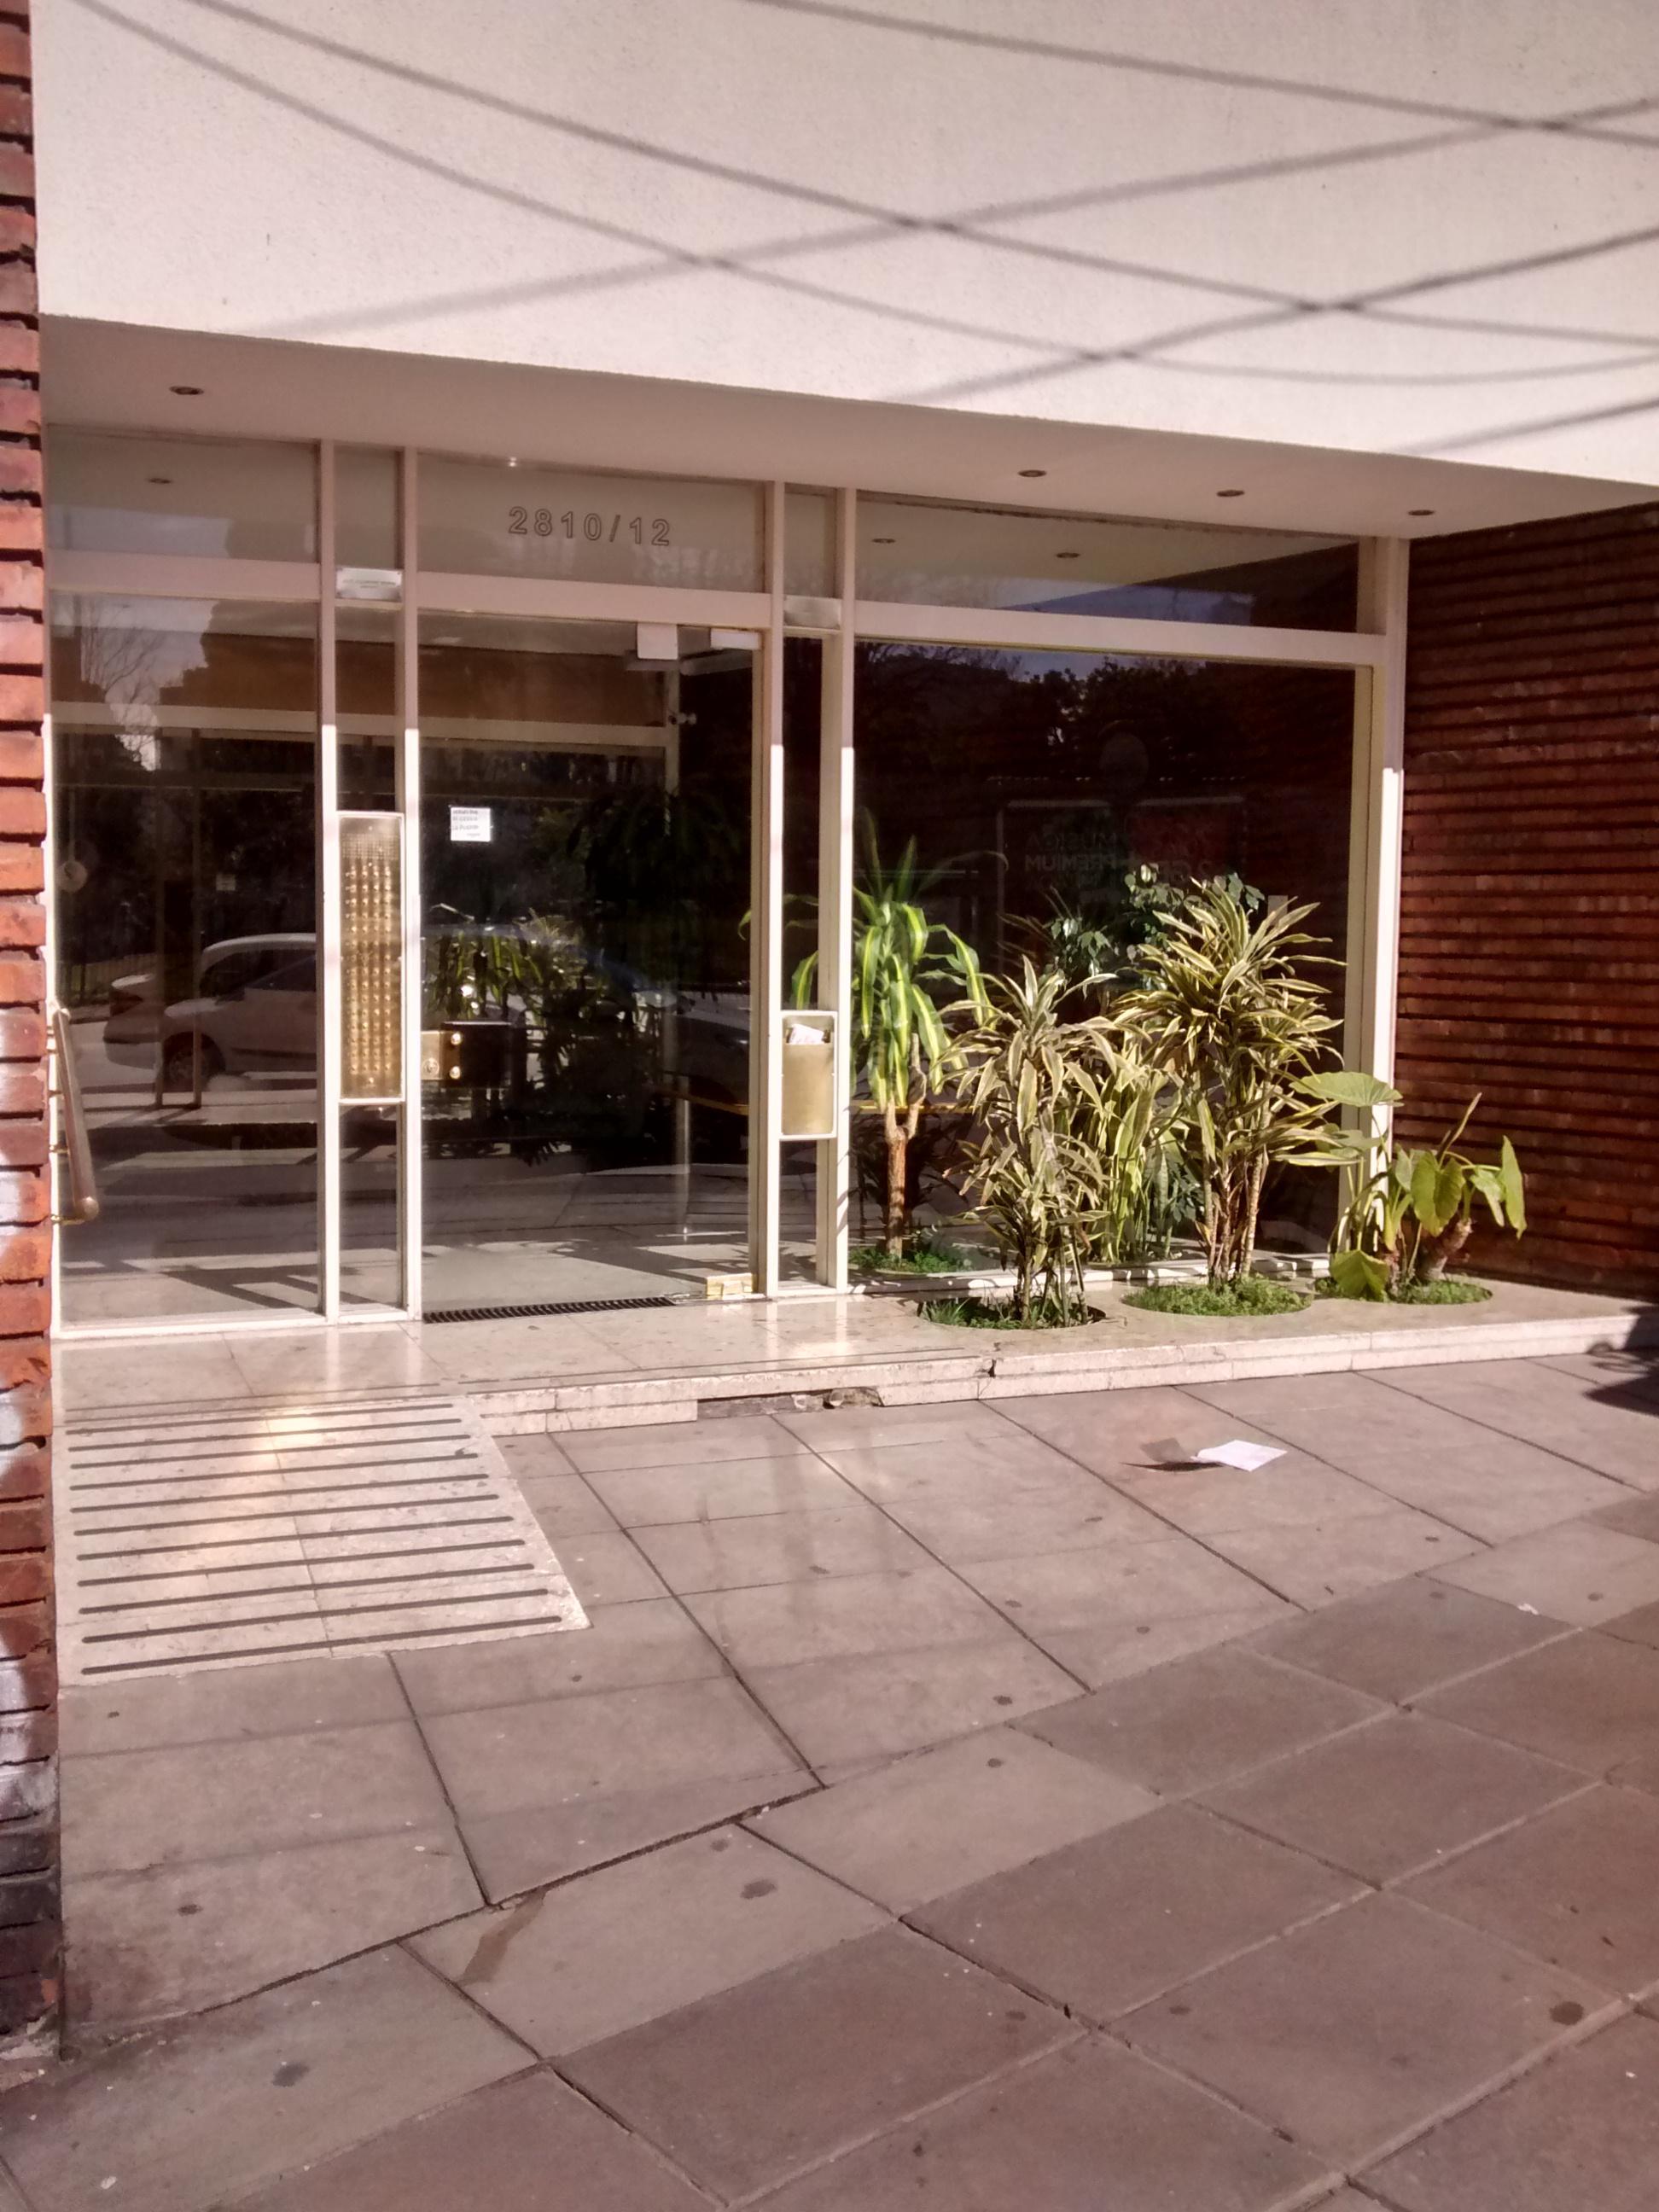 Foto Departamento en Venta |  en  Recoleta ,  Capital Federal  CORDOBA AV al 2800